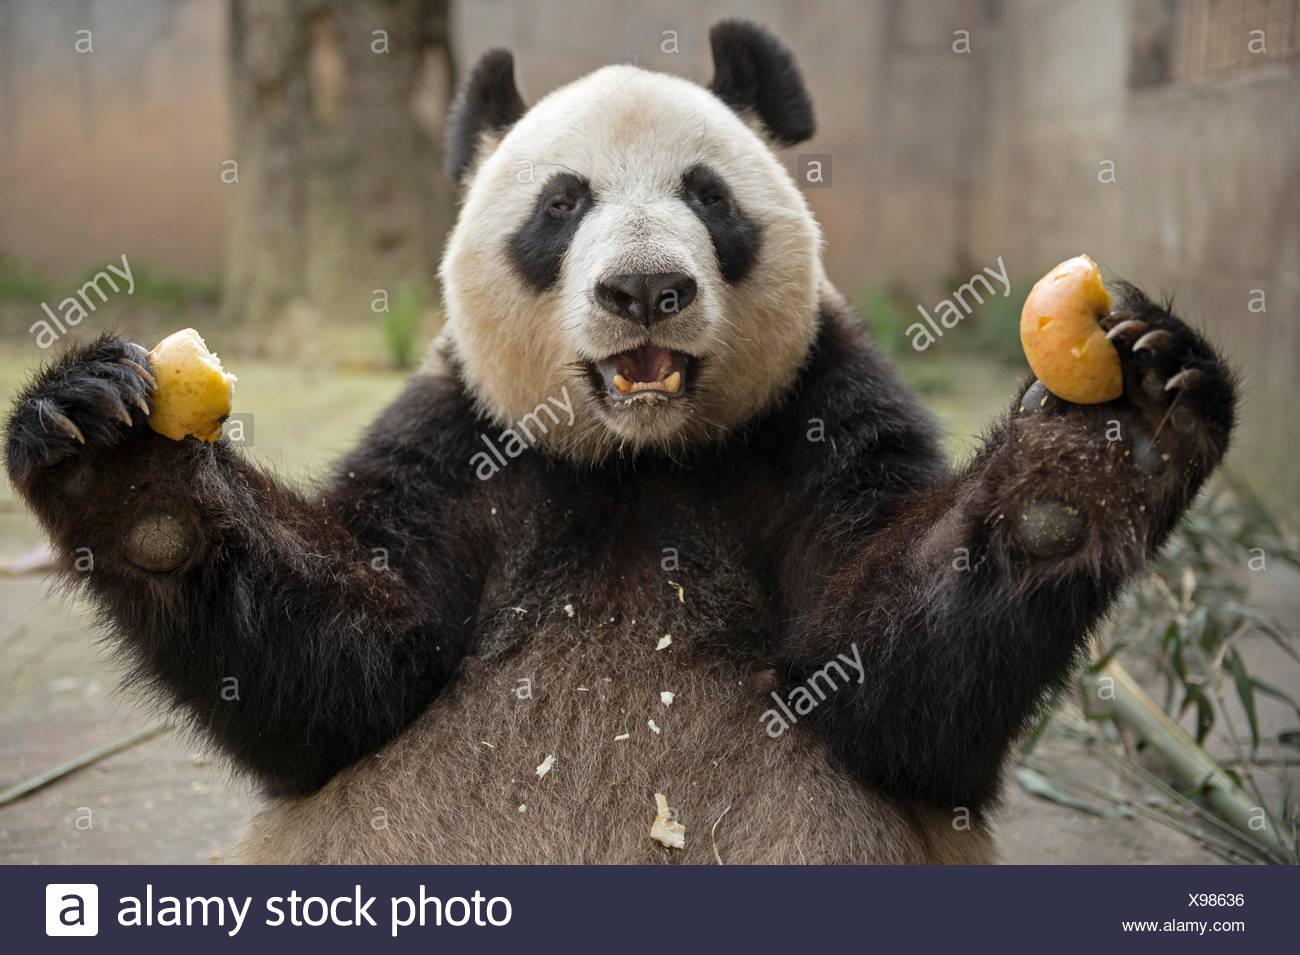 A giant panda eats inside an enclosure at the Bifengxia Giant Panda base. - Stock Image